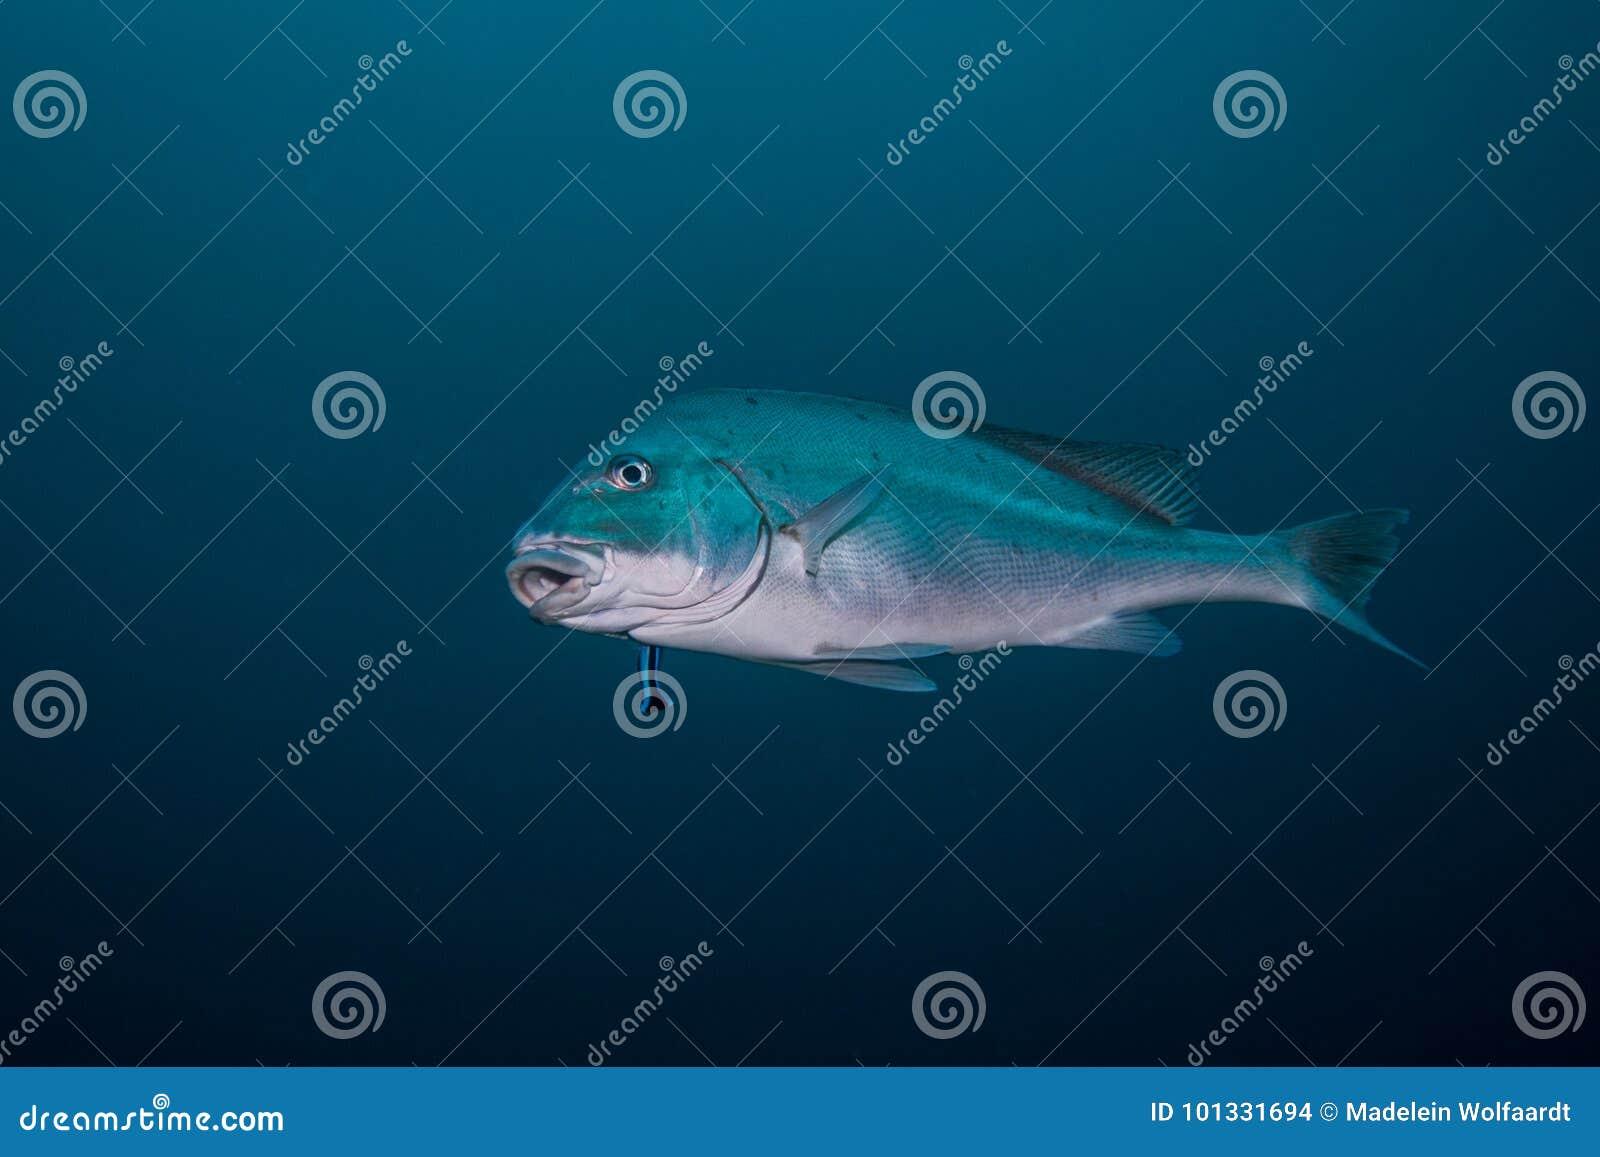 Sailfin Rubberlip / Sweetlip fish isolated swimming in open water.